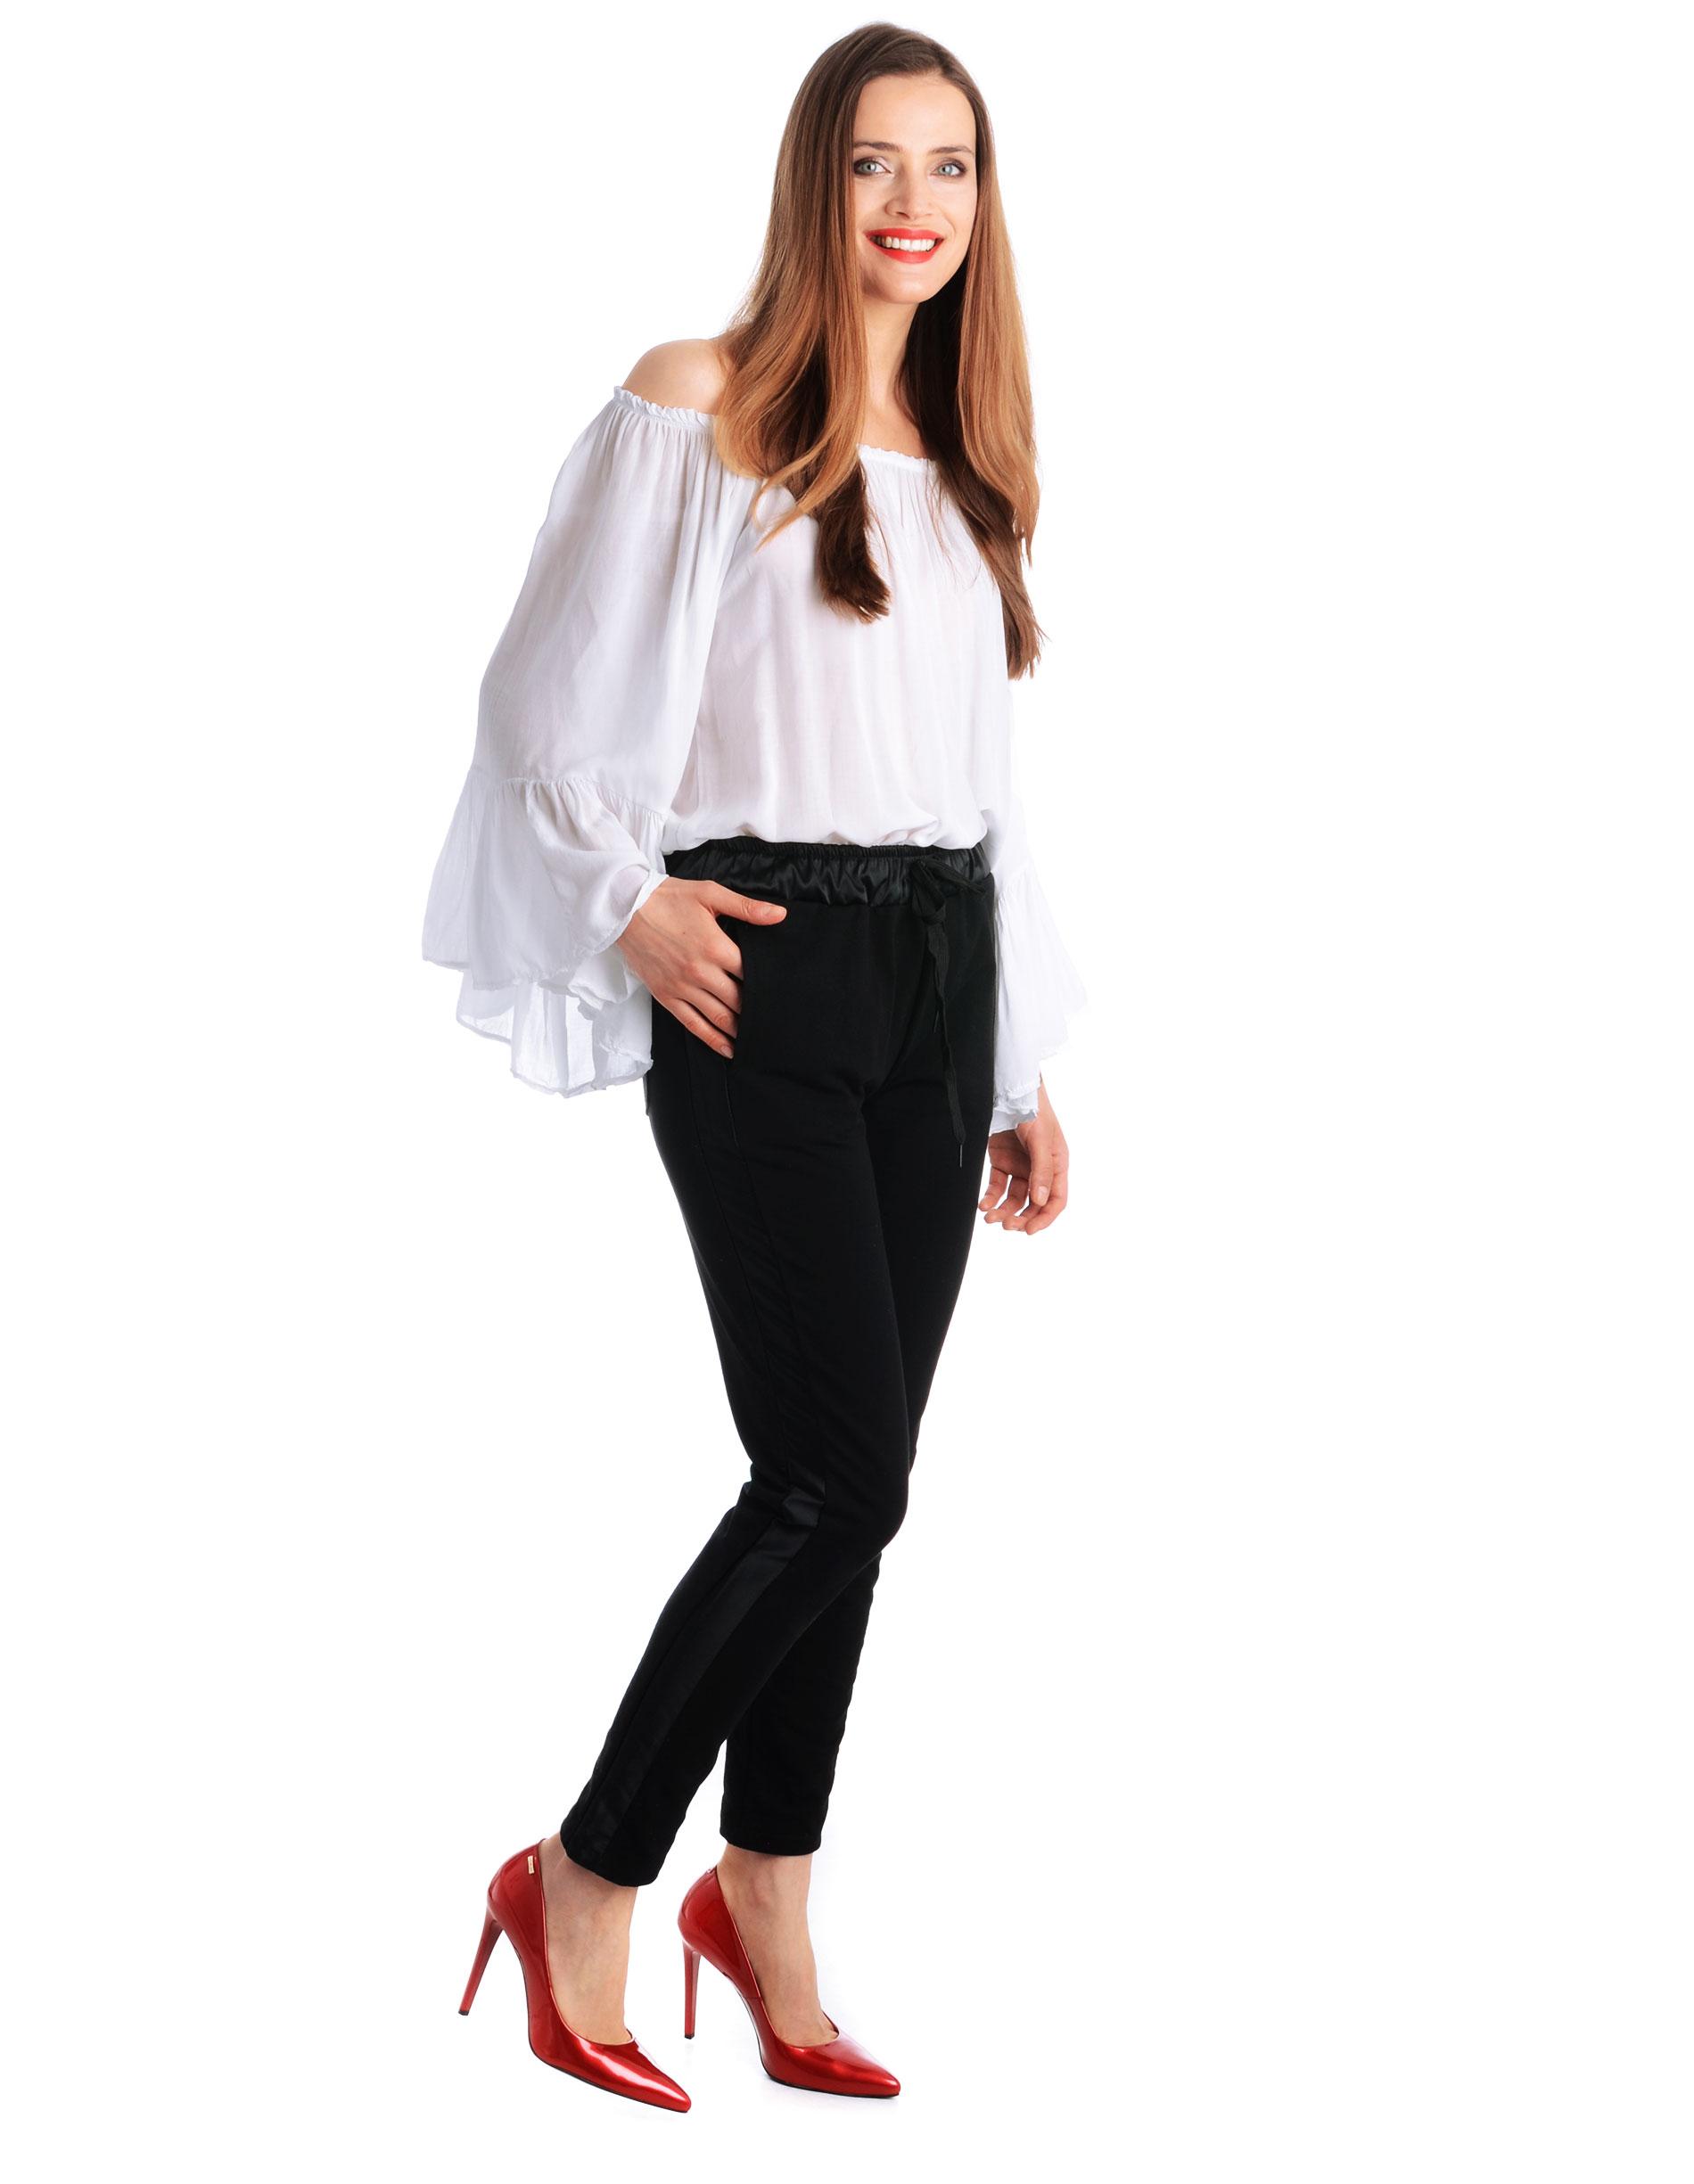 Spodnie - 90-5123 NERO - Unisono